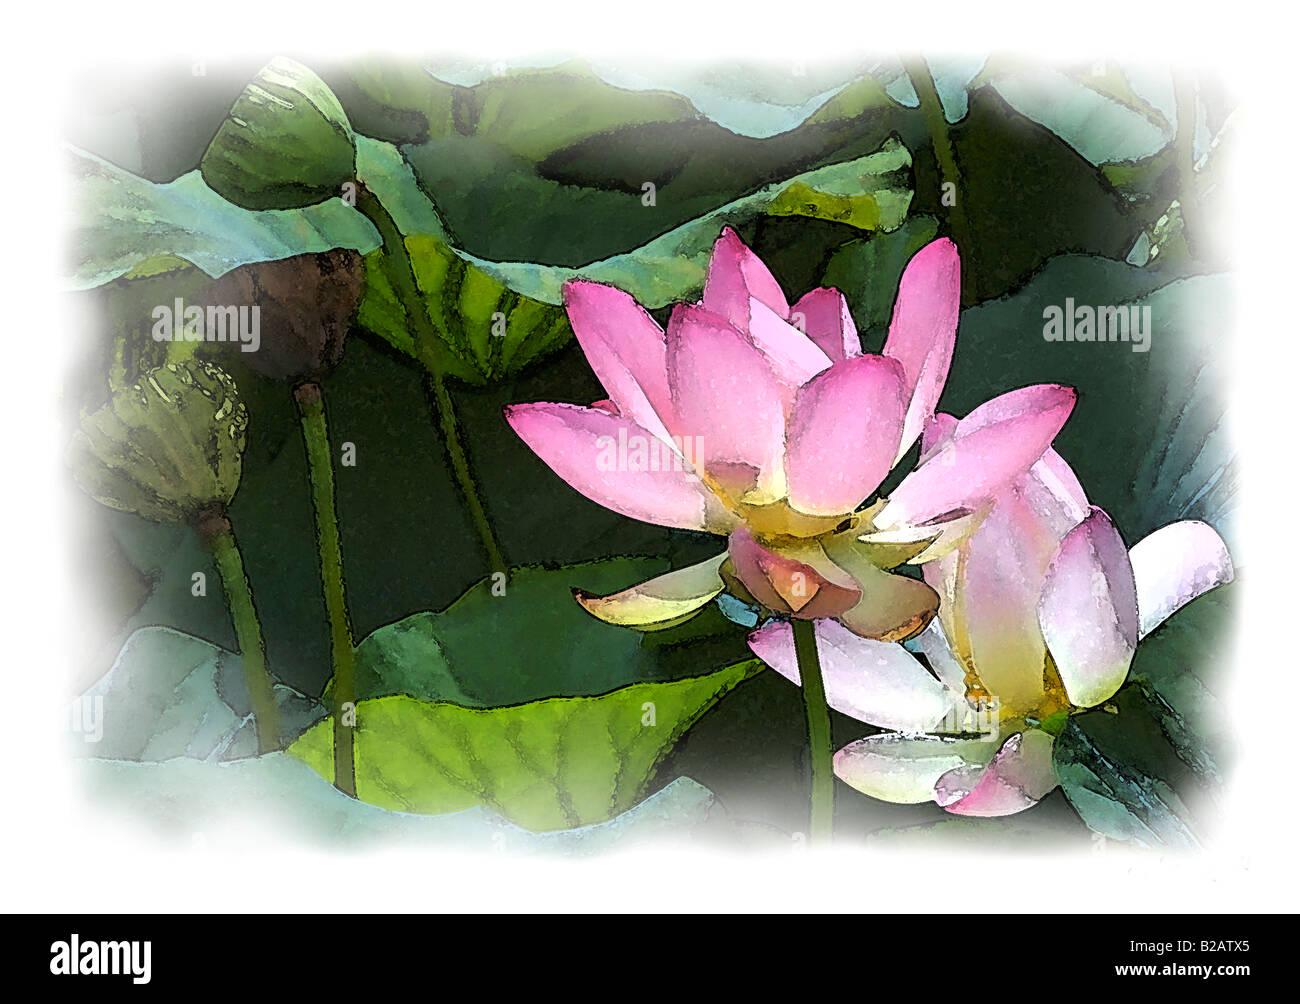 Lotus greeting stock photos lotus greeting stock images alamy pink lotus flowers water colour painting effect stock image izmirmasajfo